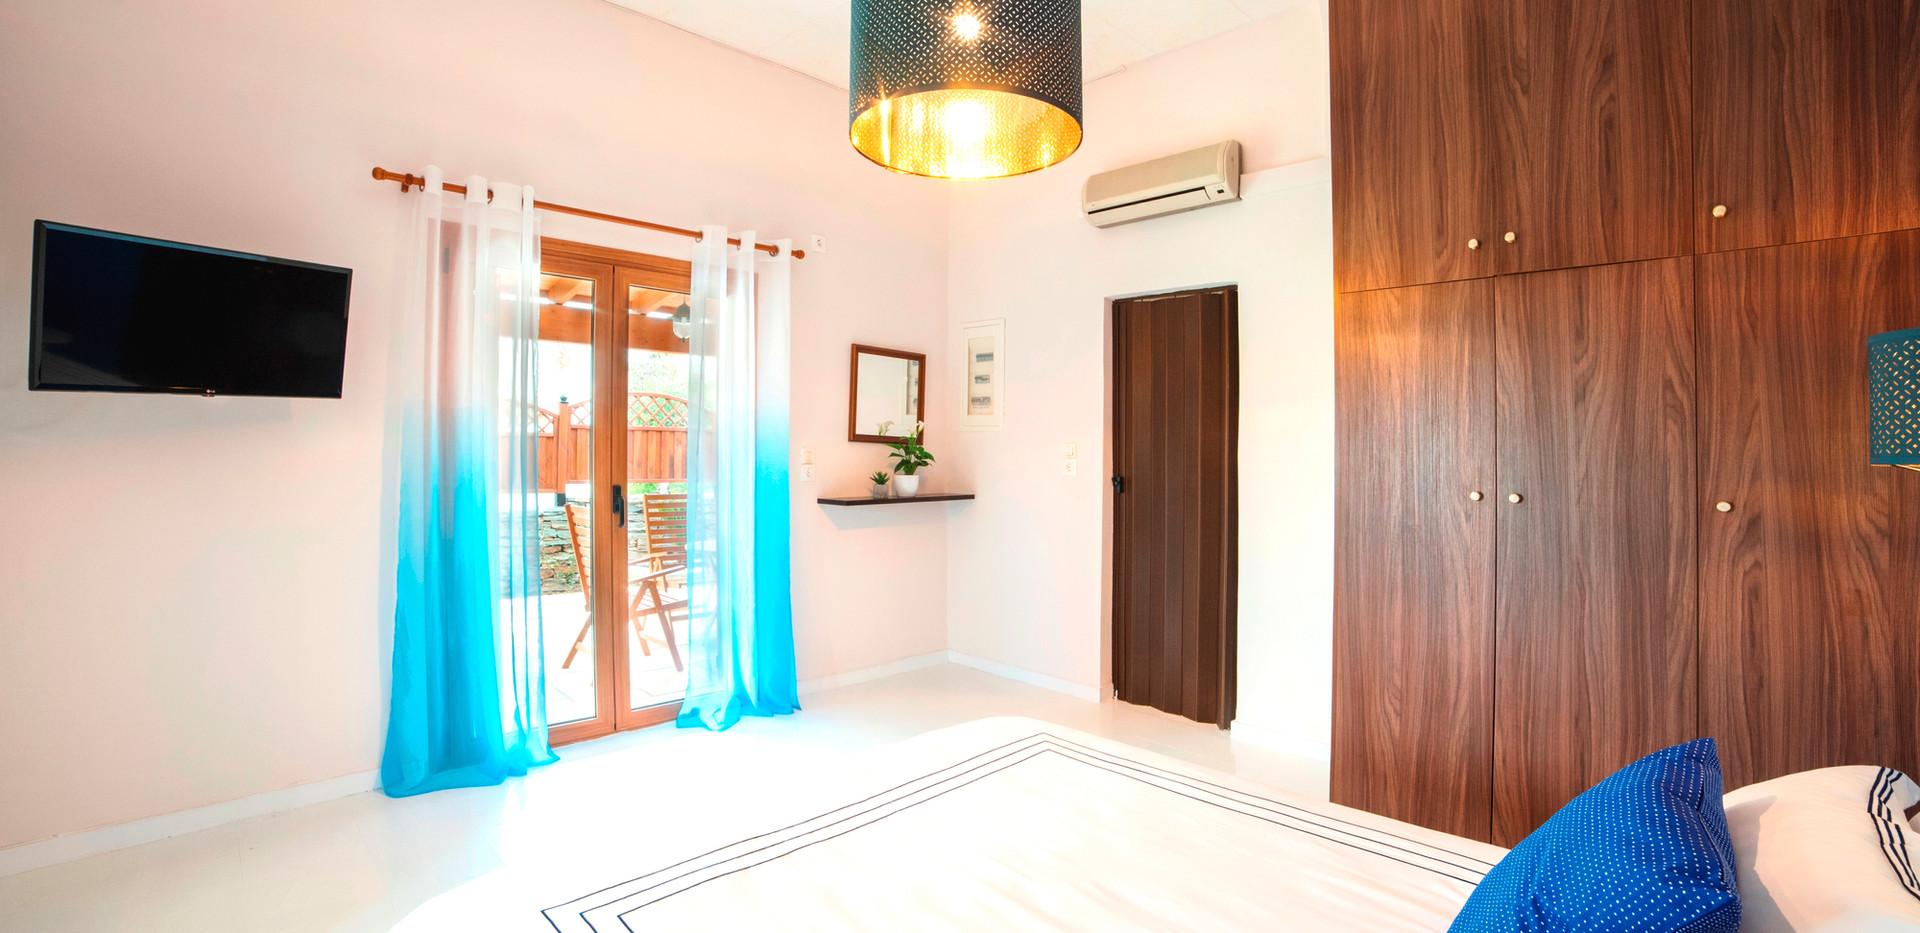 Bedroom - Smart Tv - Closet